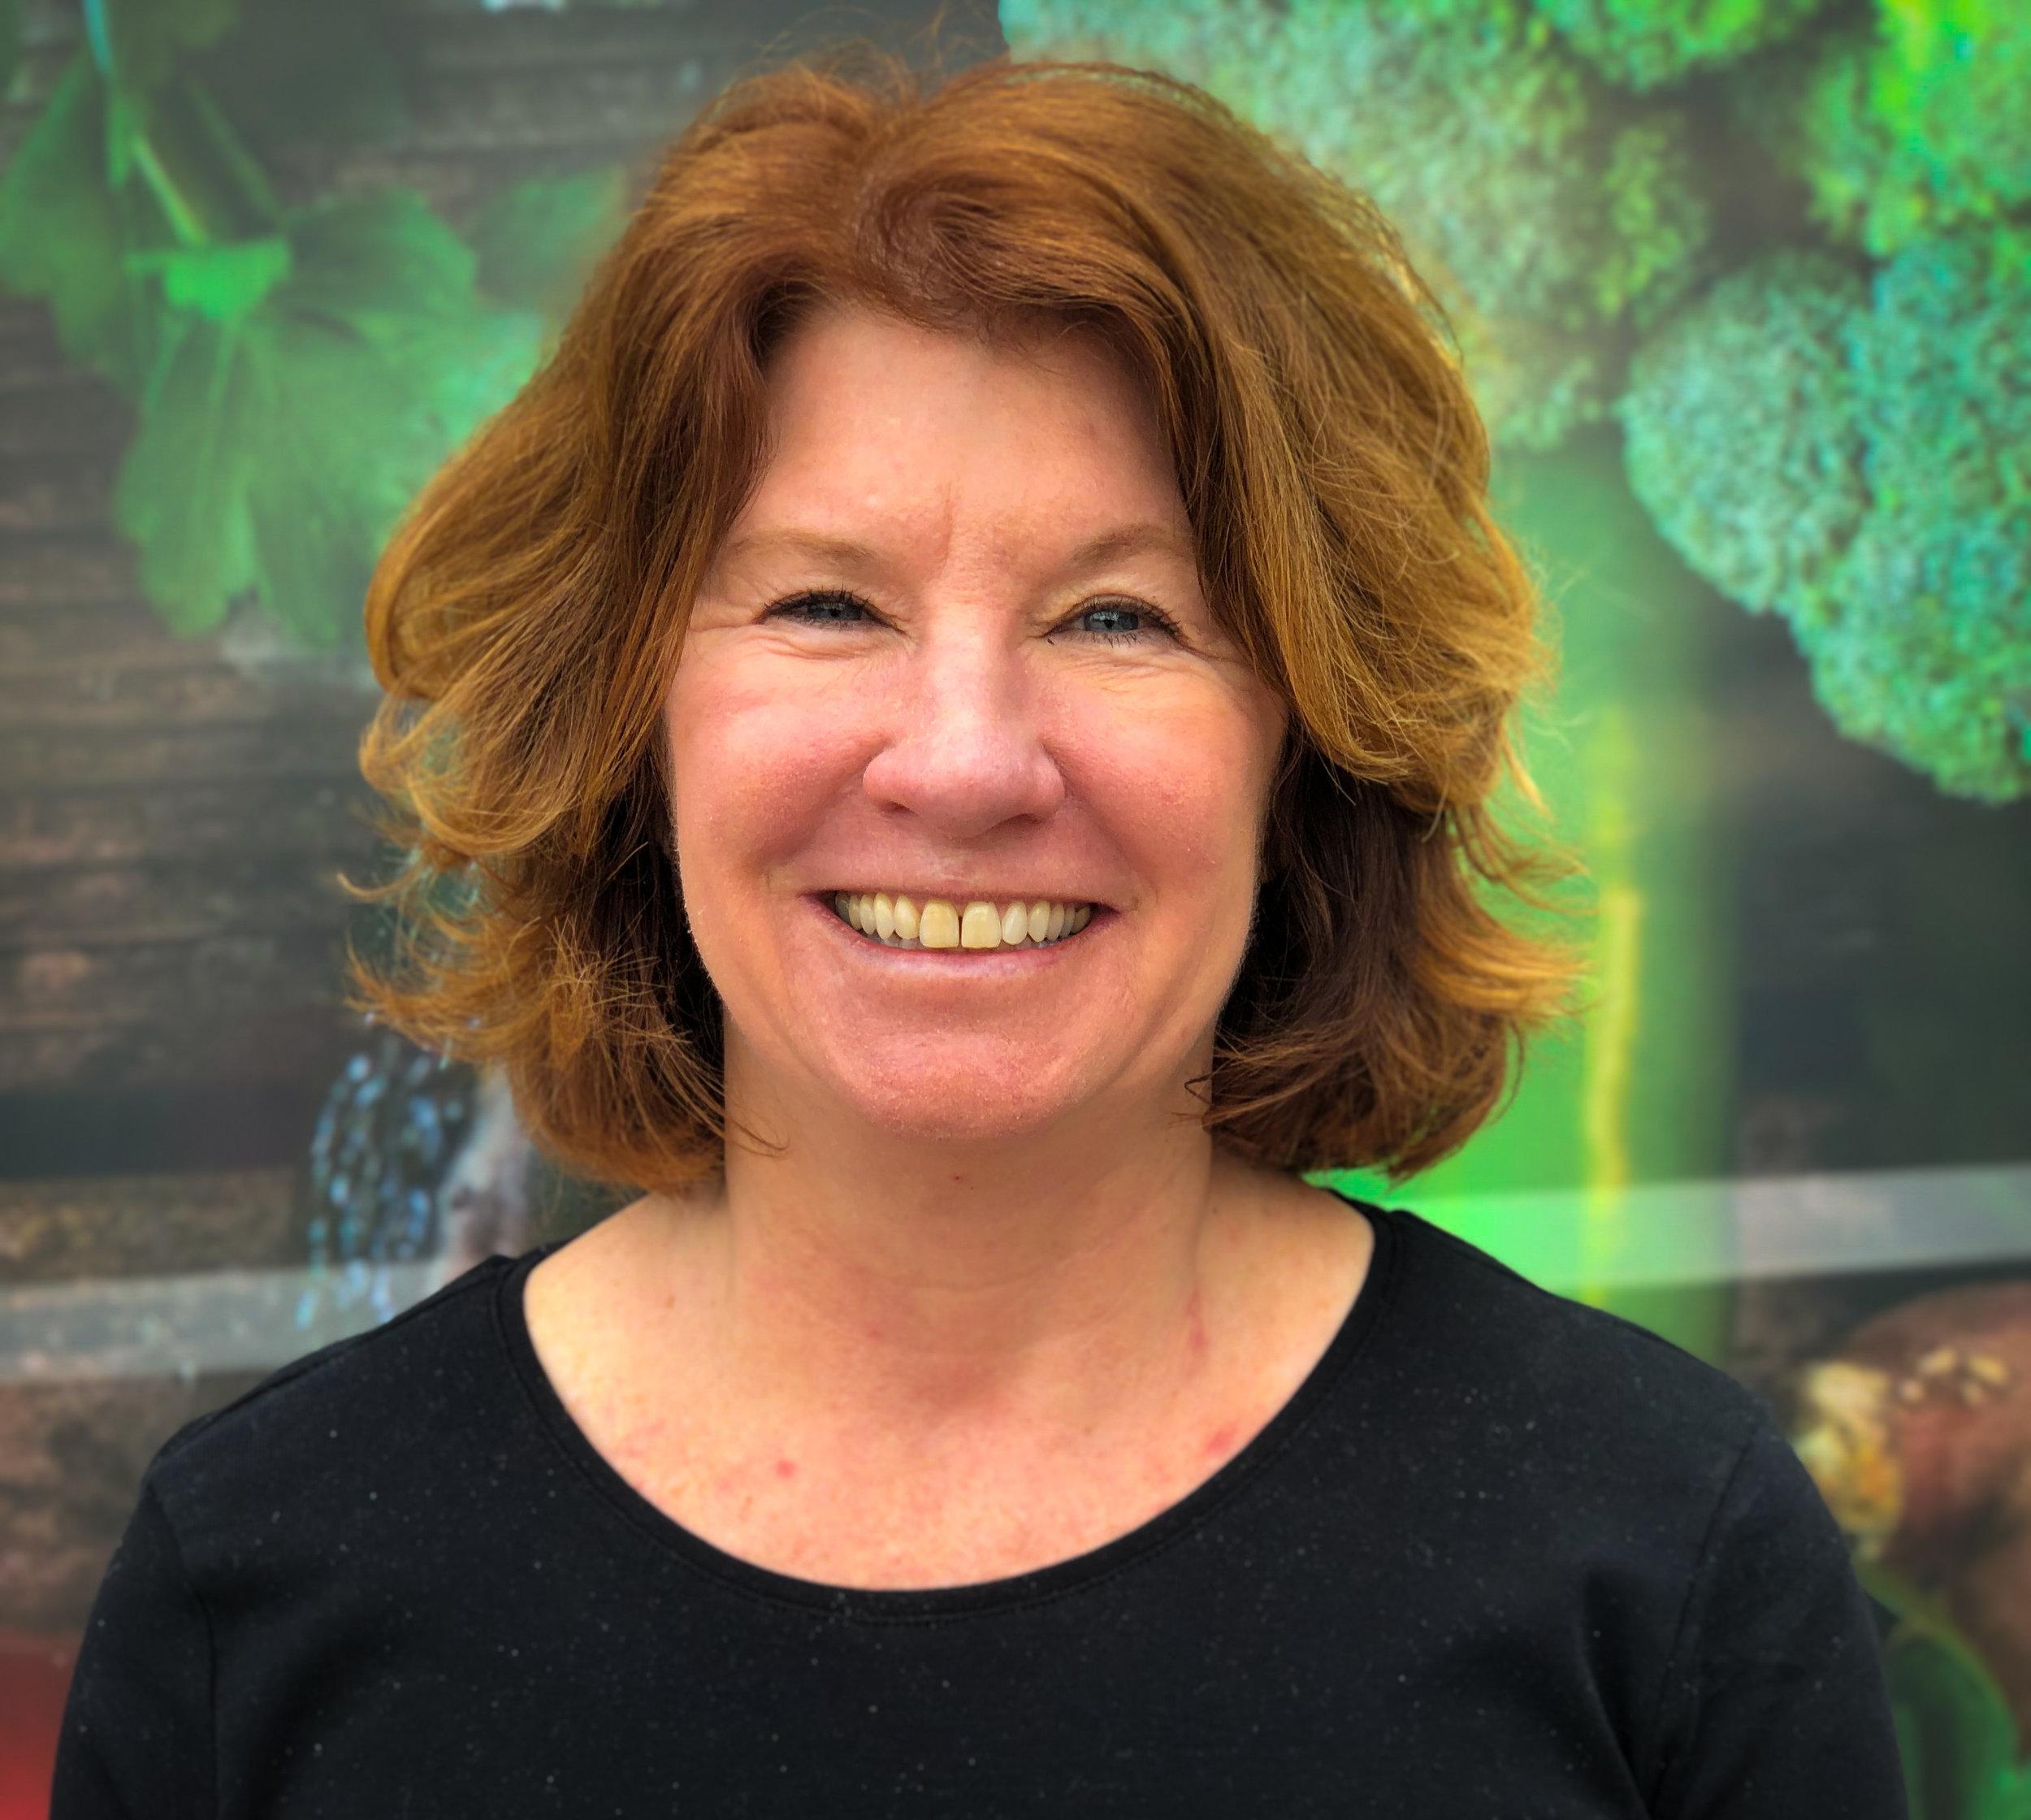 TRISh Timmers, Logistics Coordinator    Trish@lasoupecincinnati.com